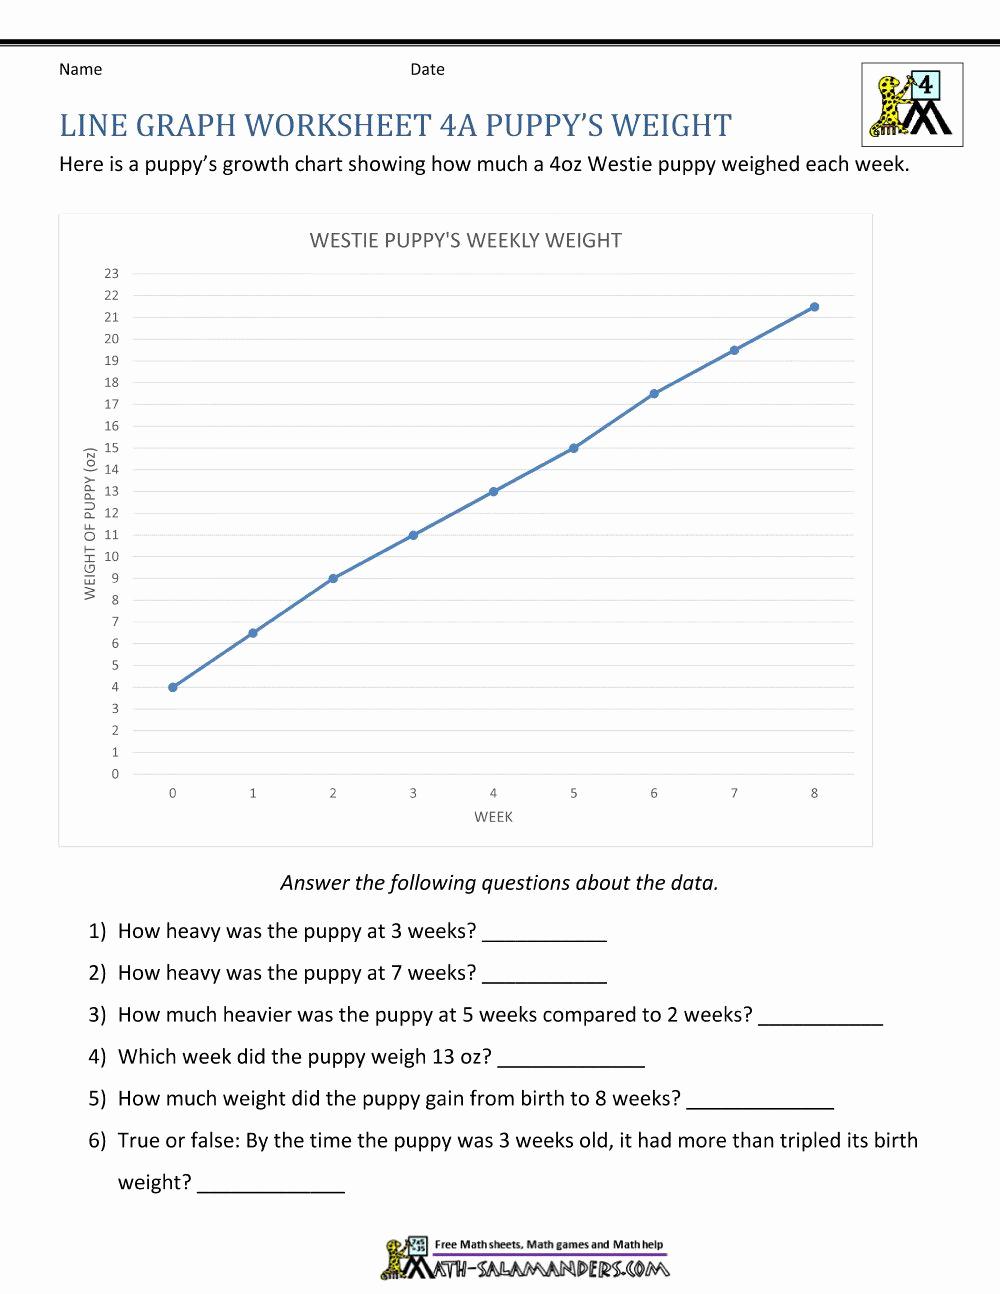 Line Graphs Worksheets 5th Grade Unique Line Graph Worksheets 5th Grade In 2020